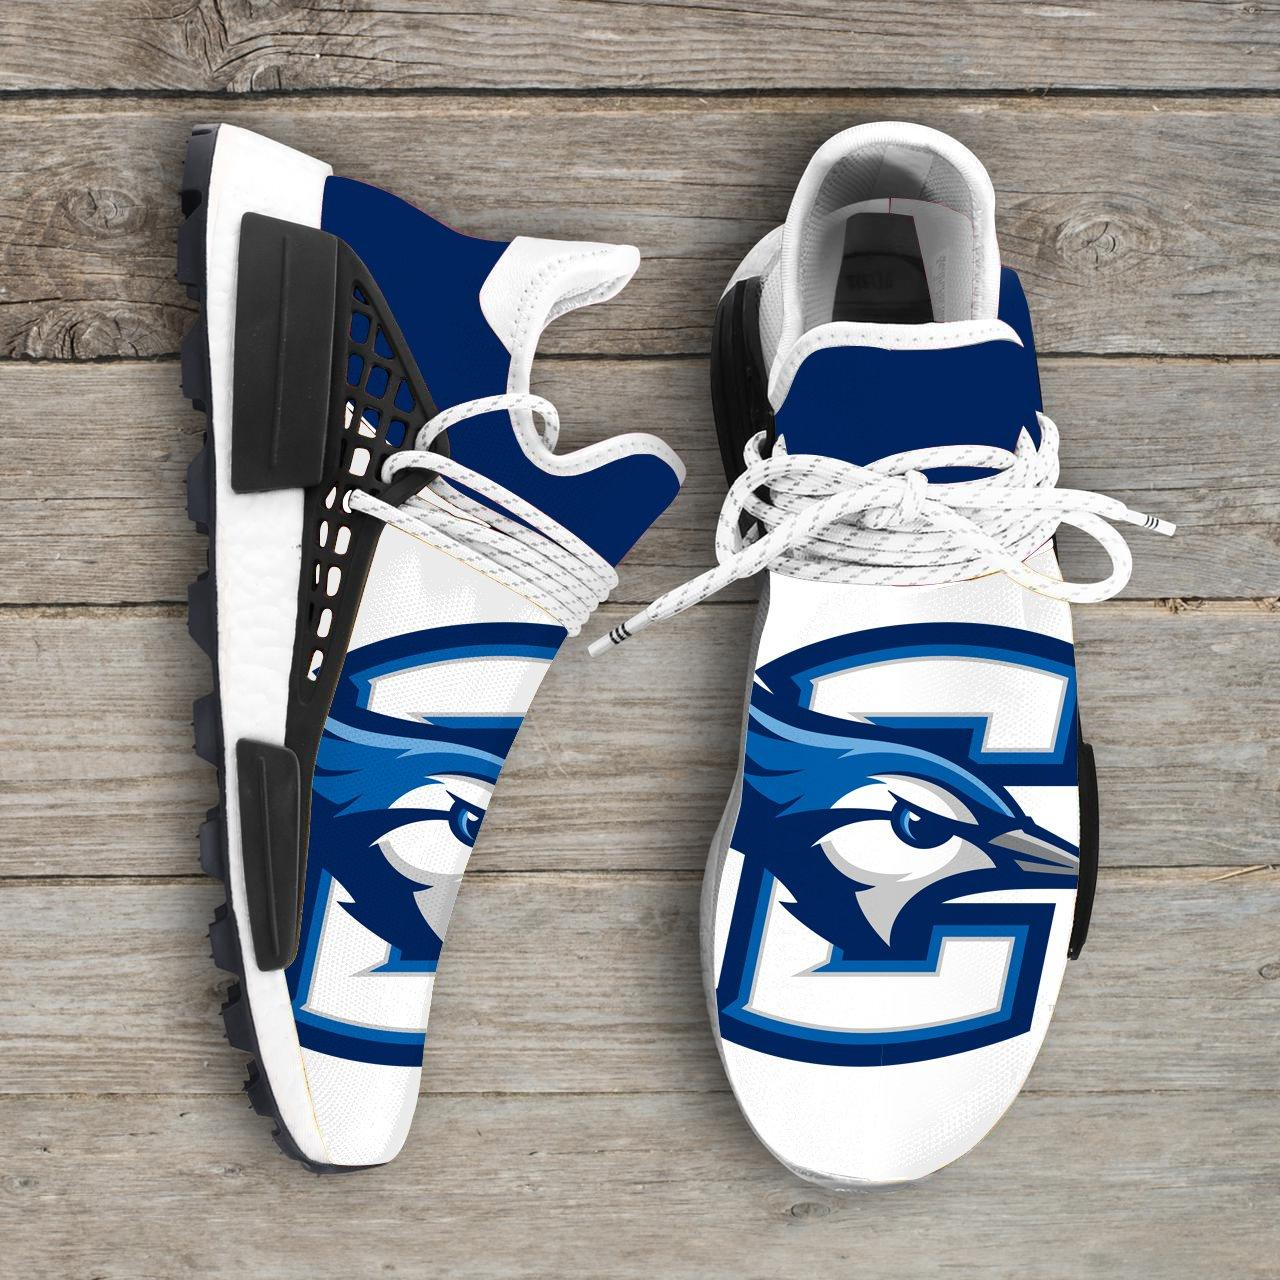 Creighton Bluejays Ncaa NMD Human Shoes